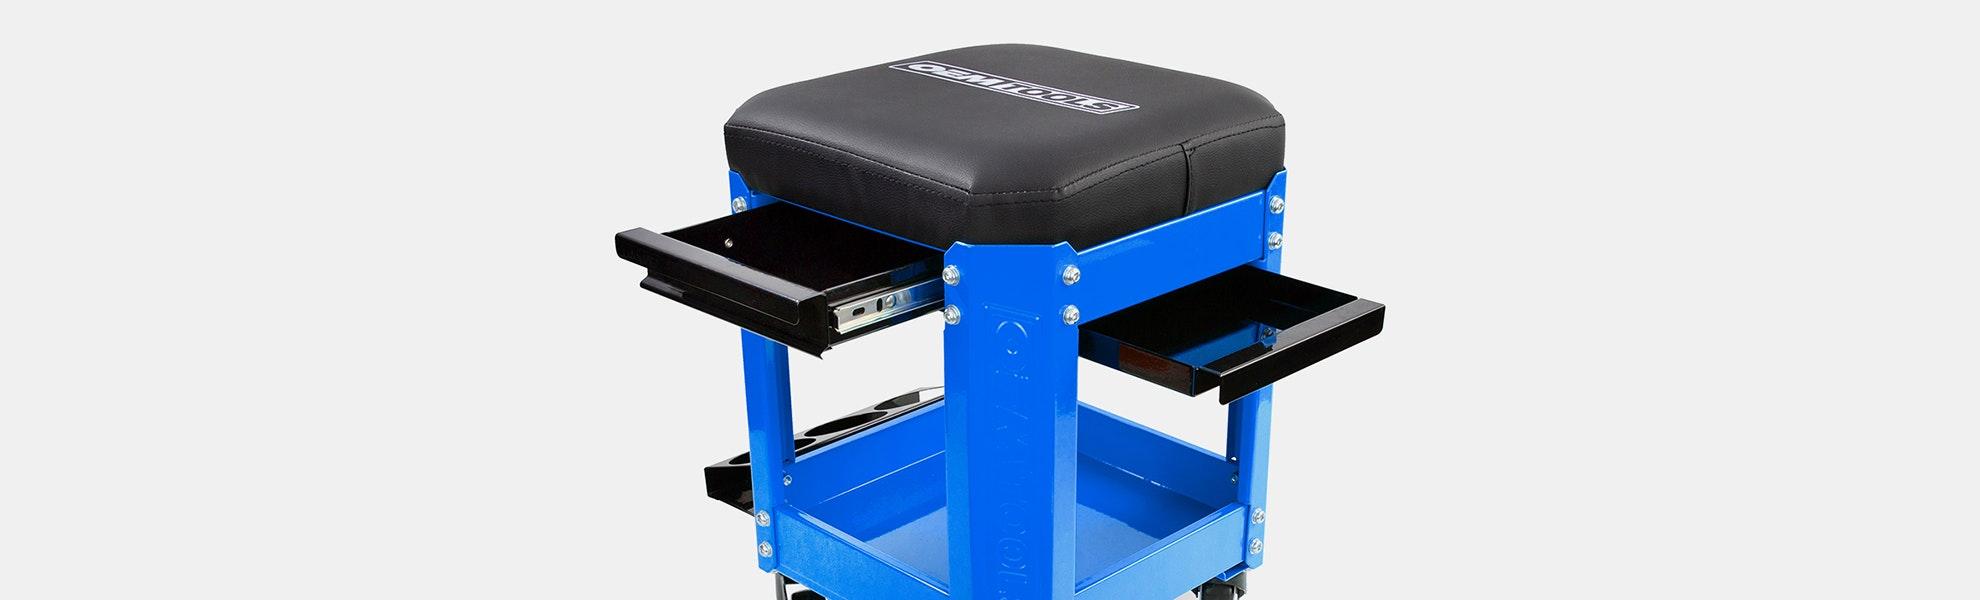 OEM Tools 2-Drawer Workshop Creeper Seat